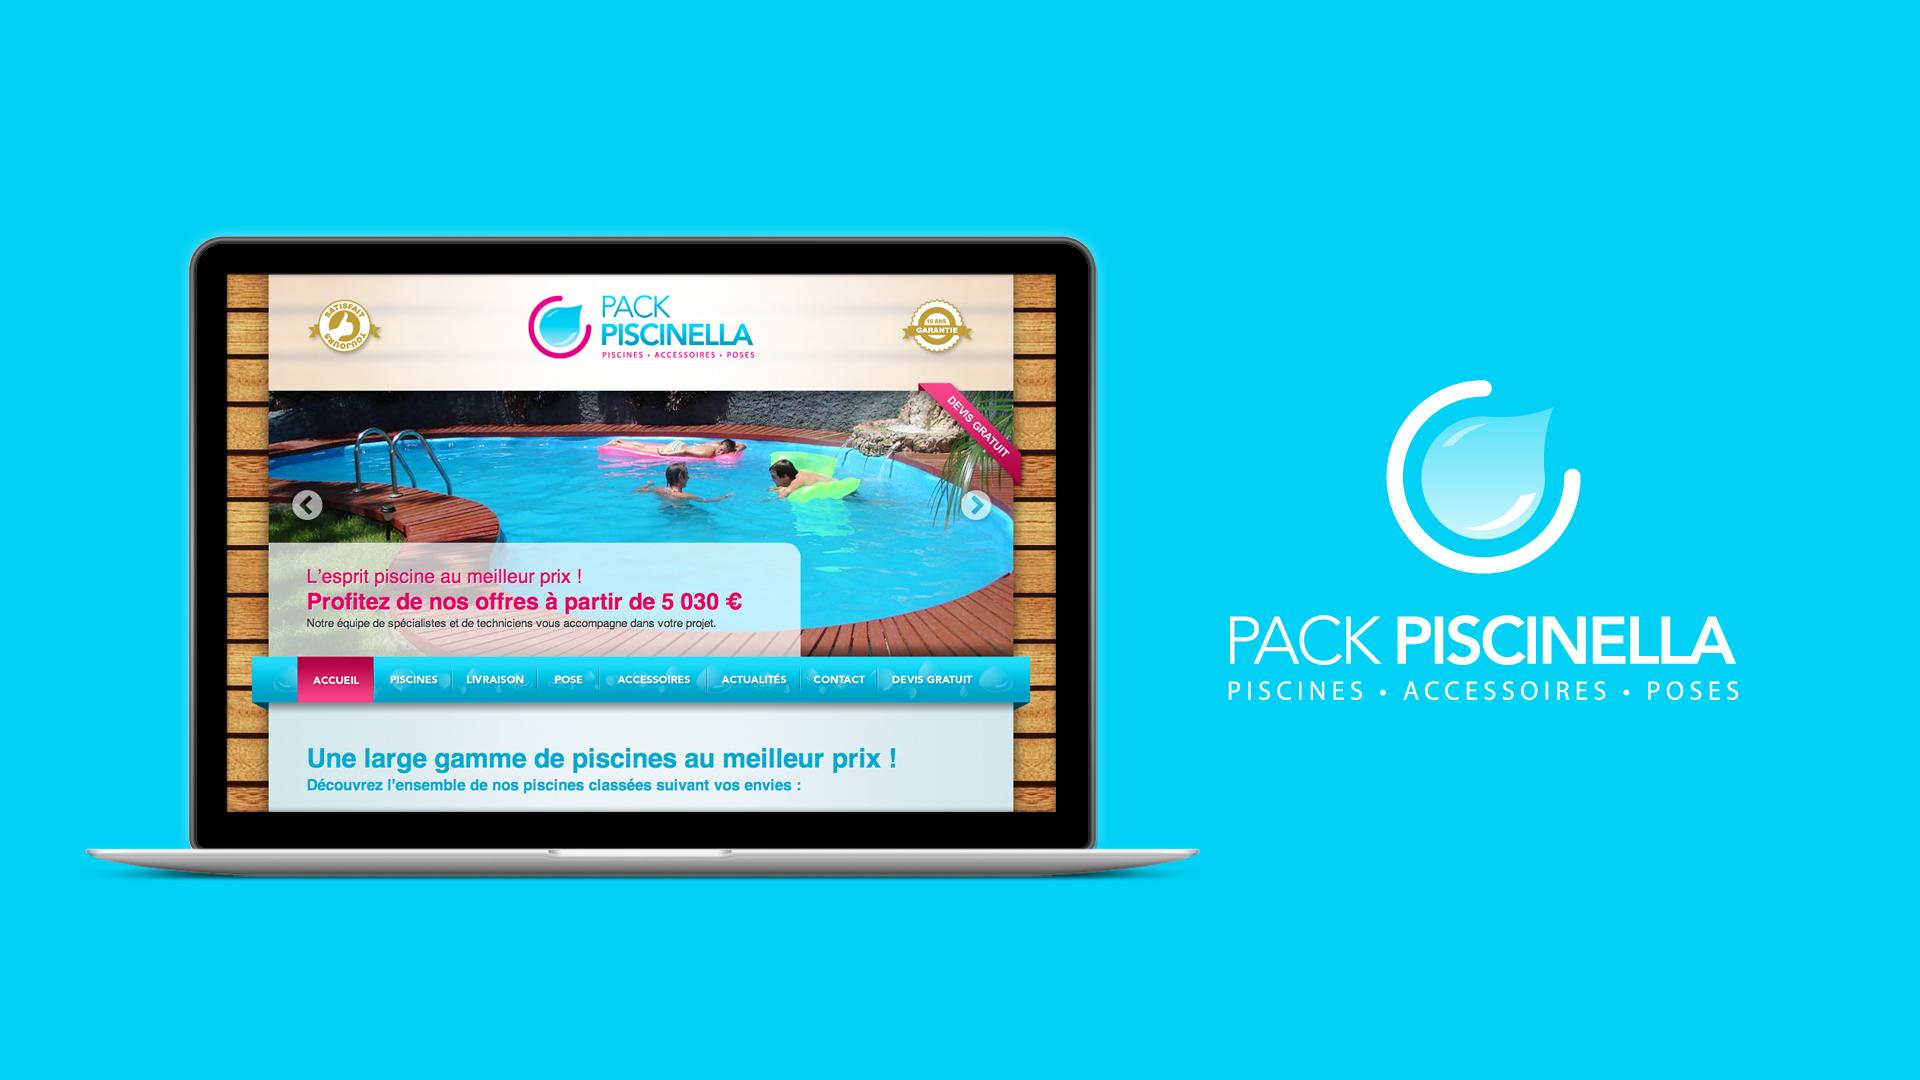 pack-piscinella-creation-logo-site-internet-communication-caconcept-alexis-cretin-graphiste-bis